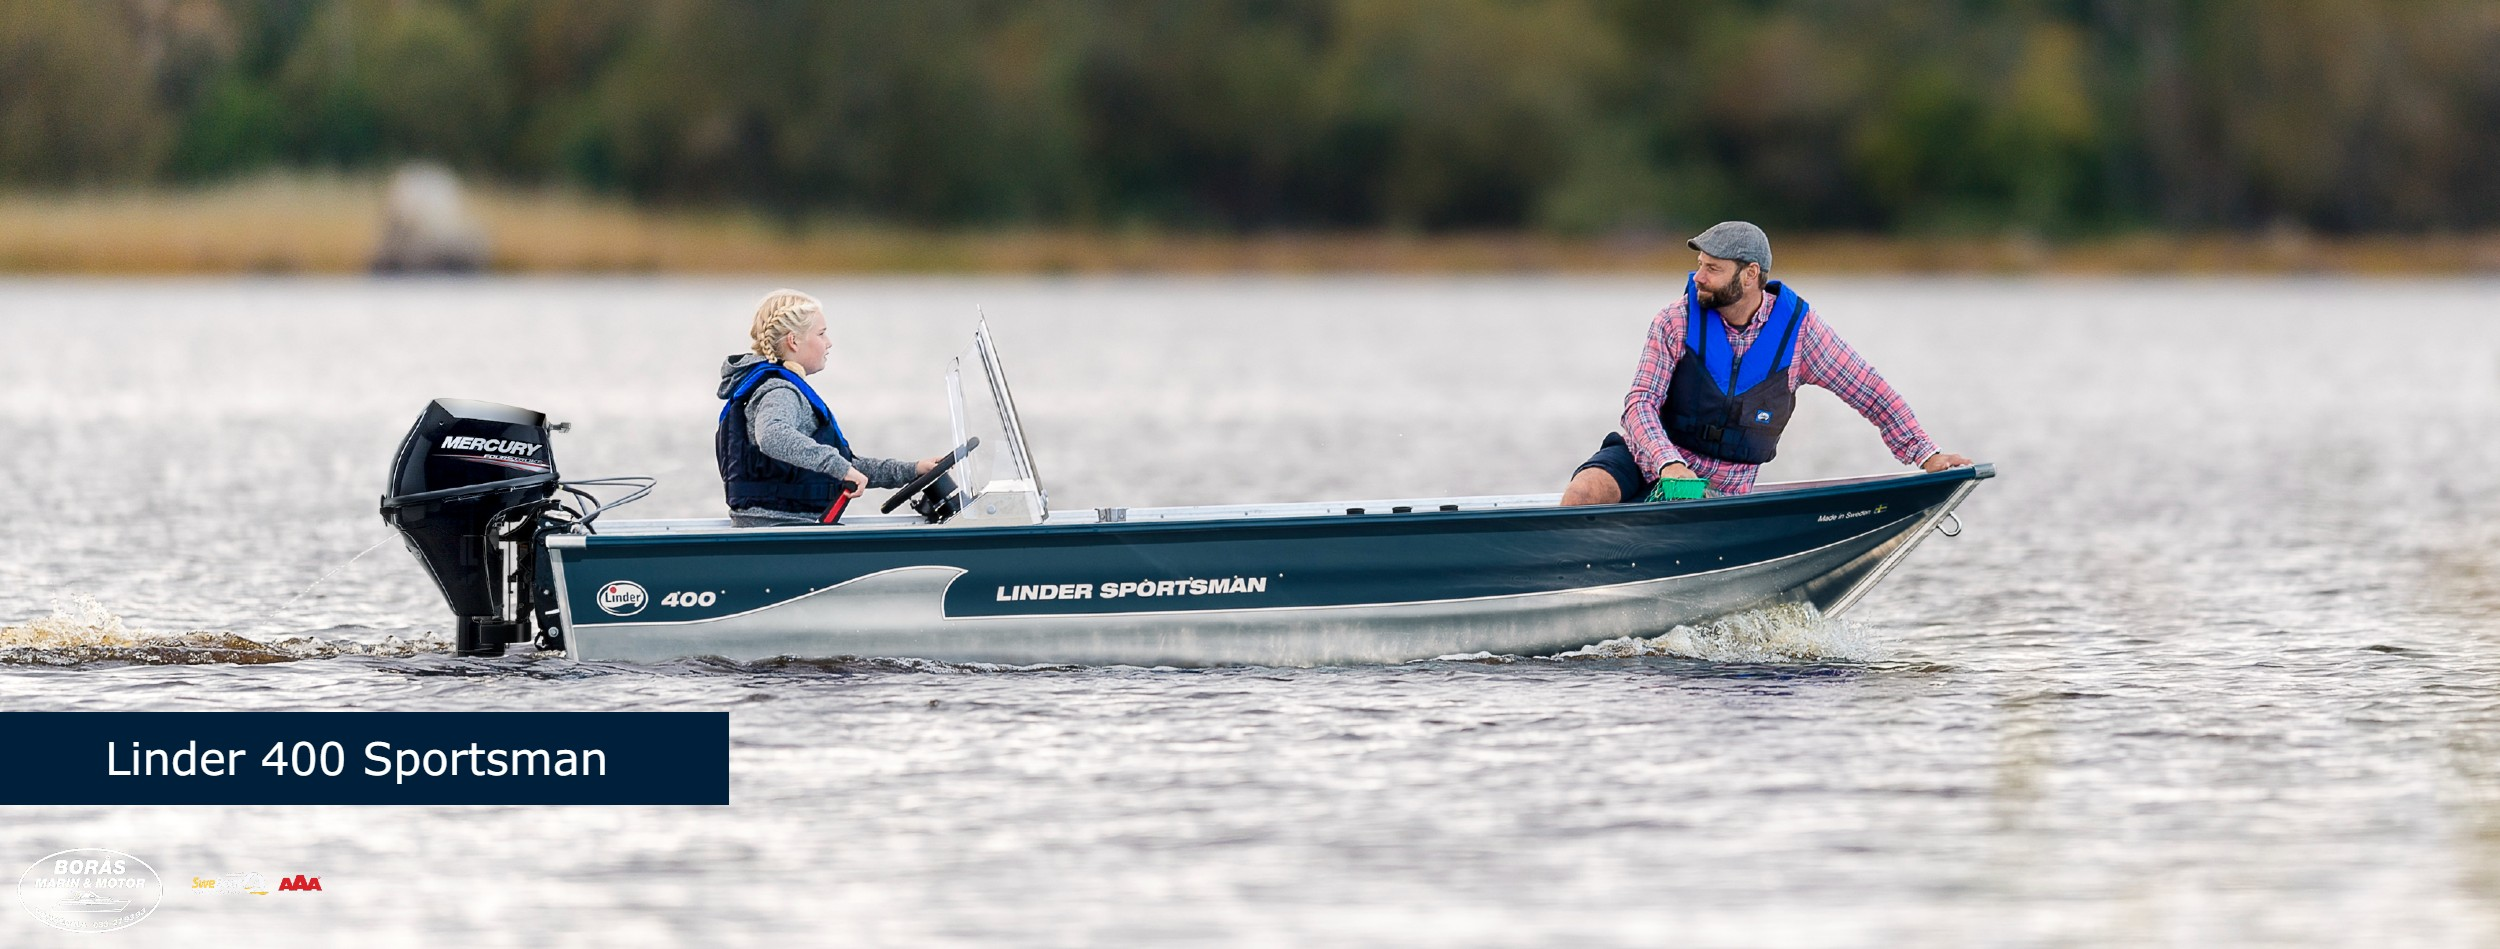 Linder-400-sportsman-bildspel